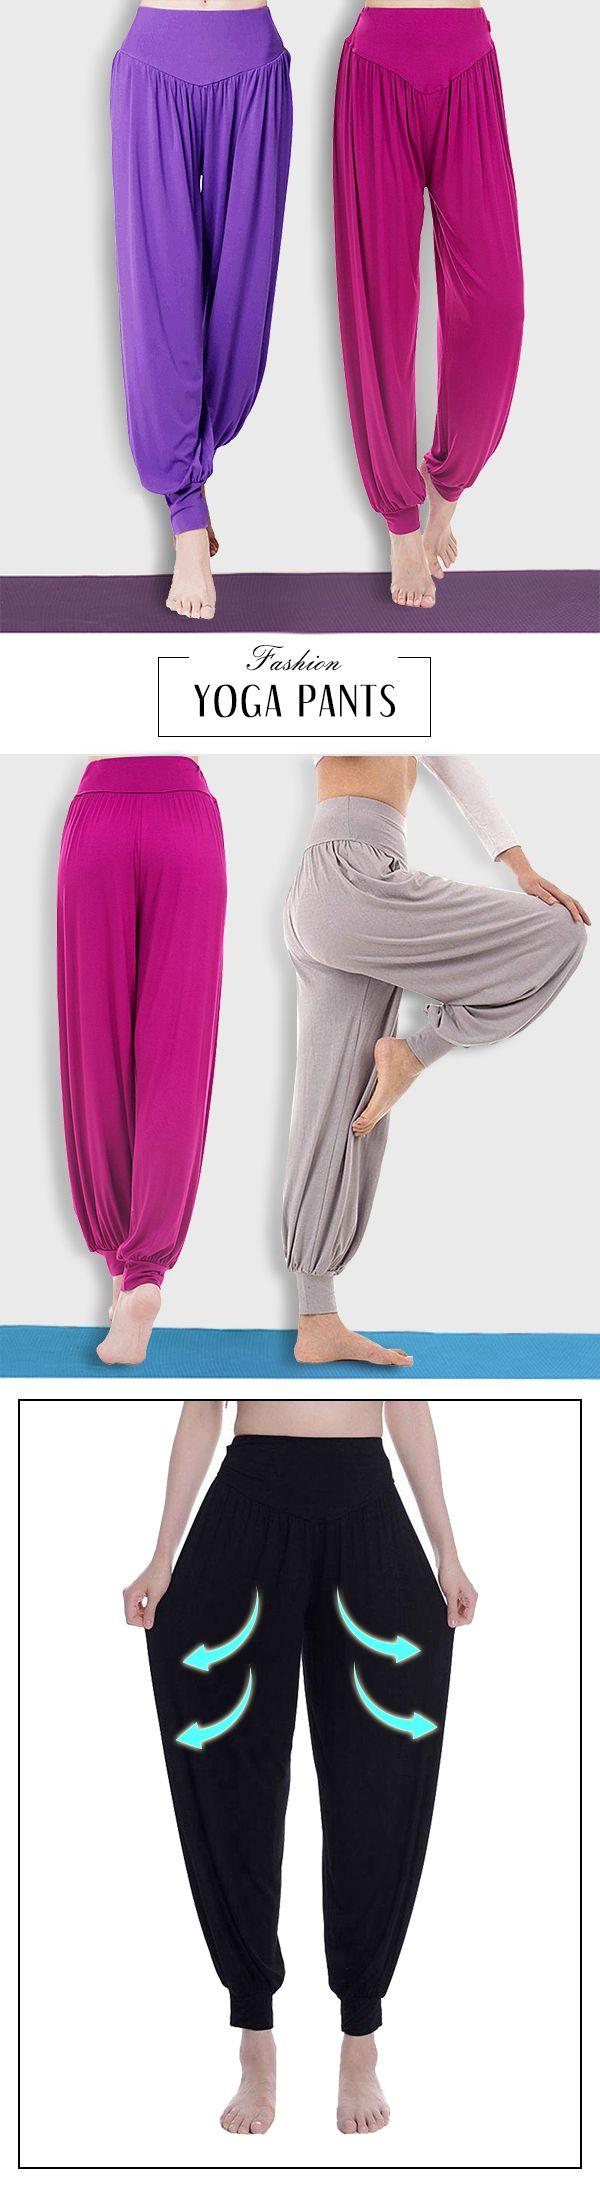 US$ 12.37 Solid Loose Pleated Harem Dance Yoga Pants